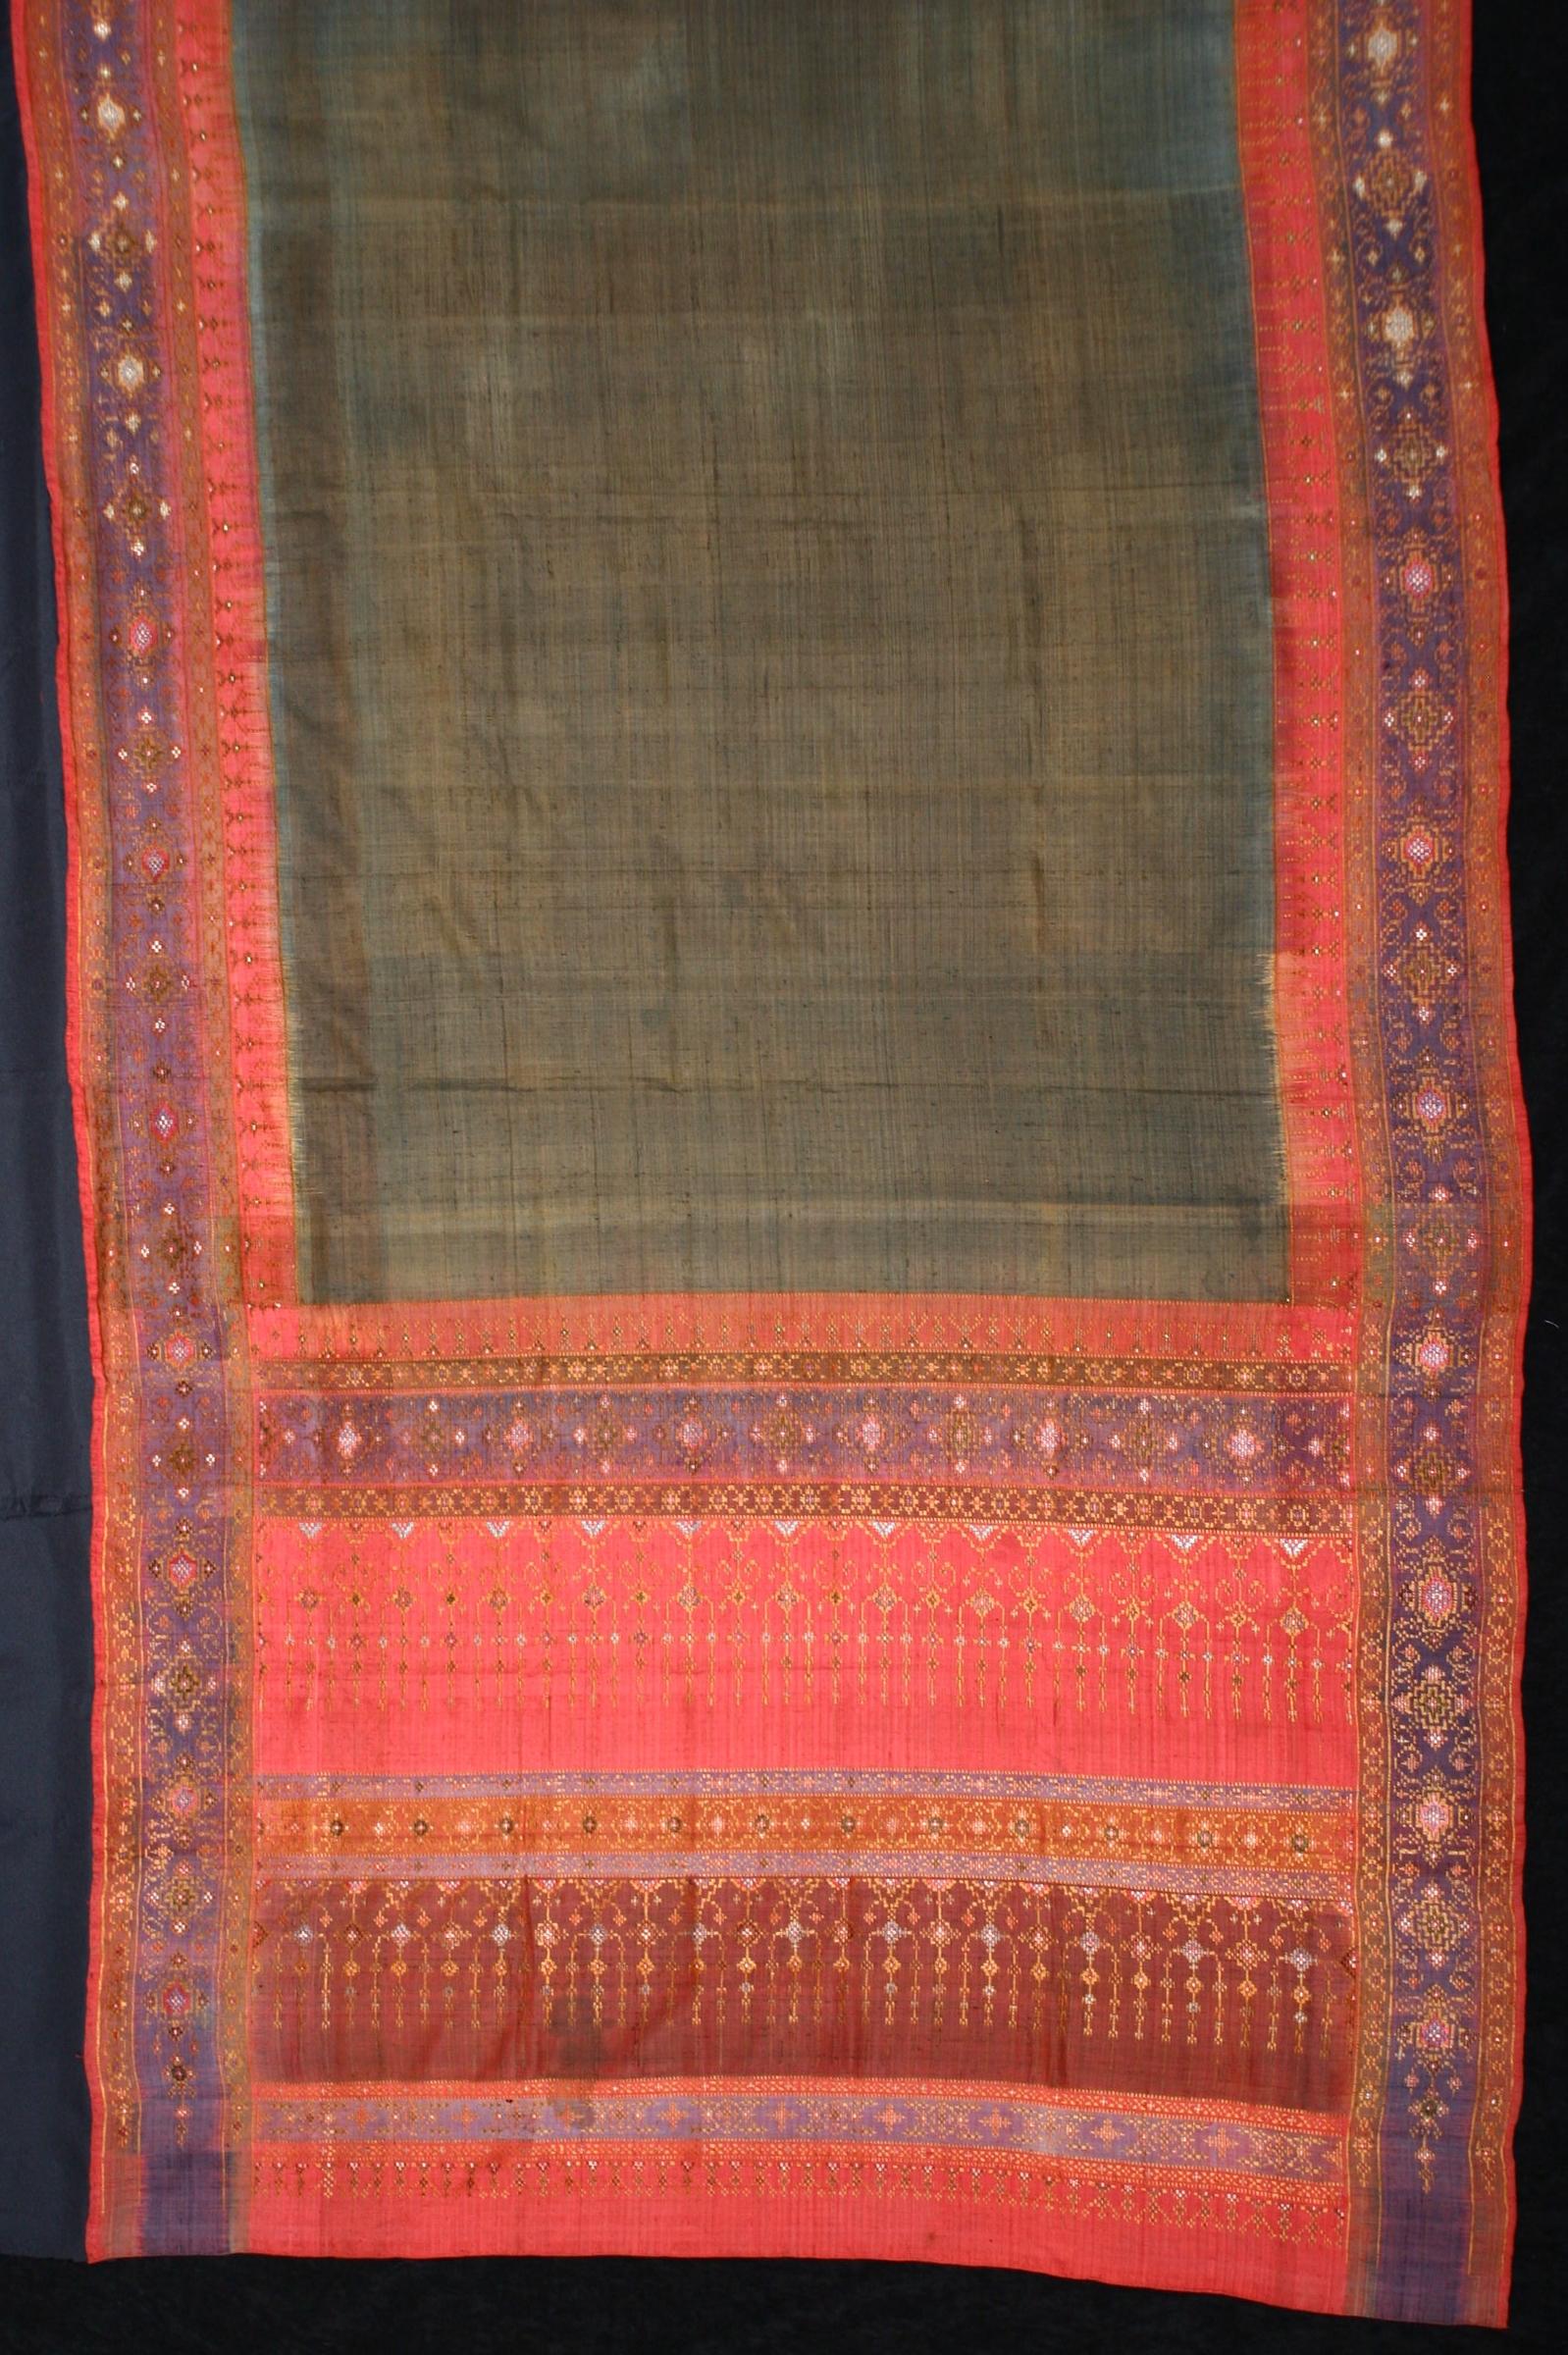 Silk hipwrapper, Nakhon Si Thammarat, Malay Peninsula, 19th century.